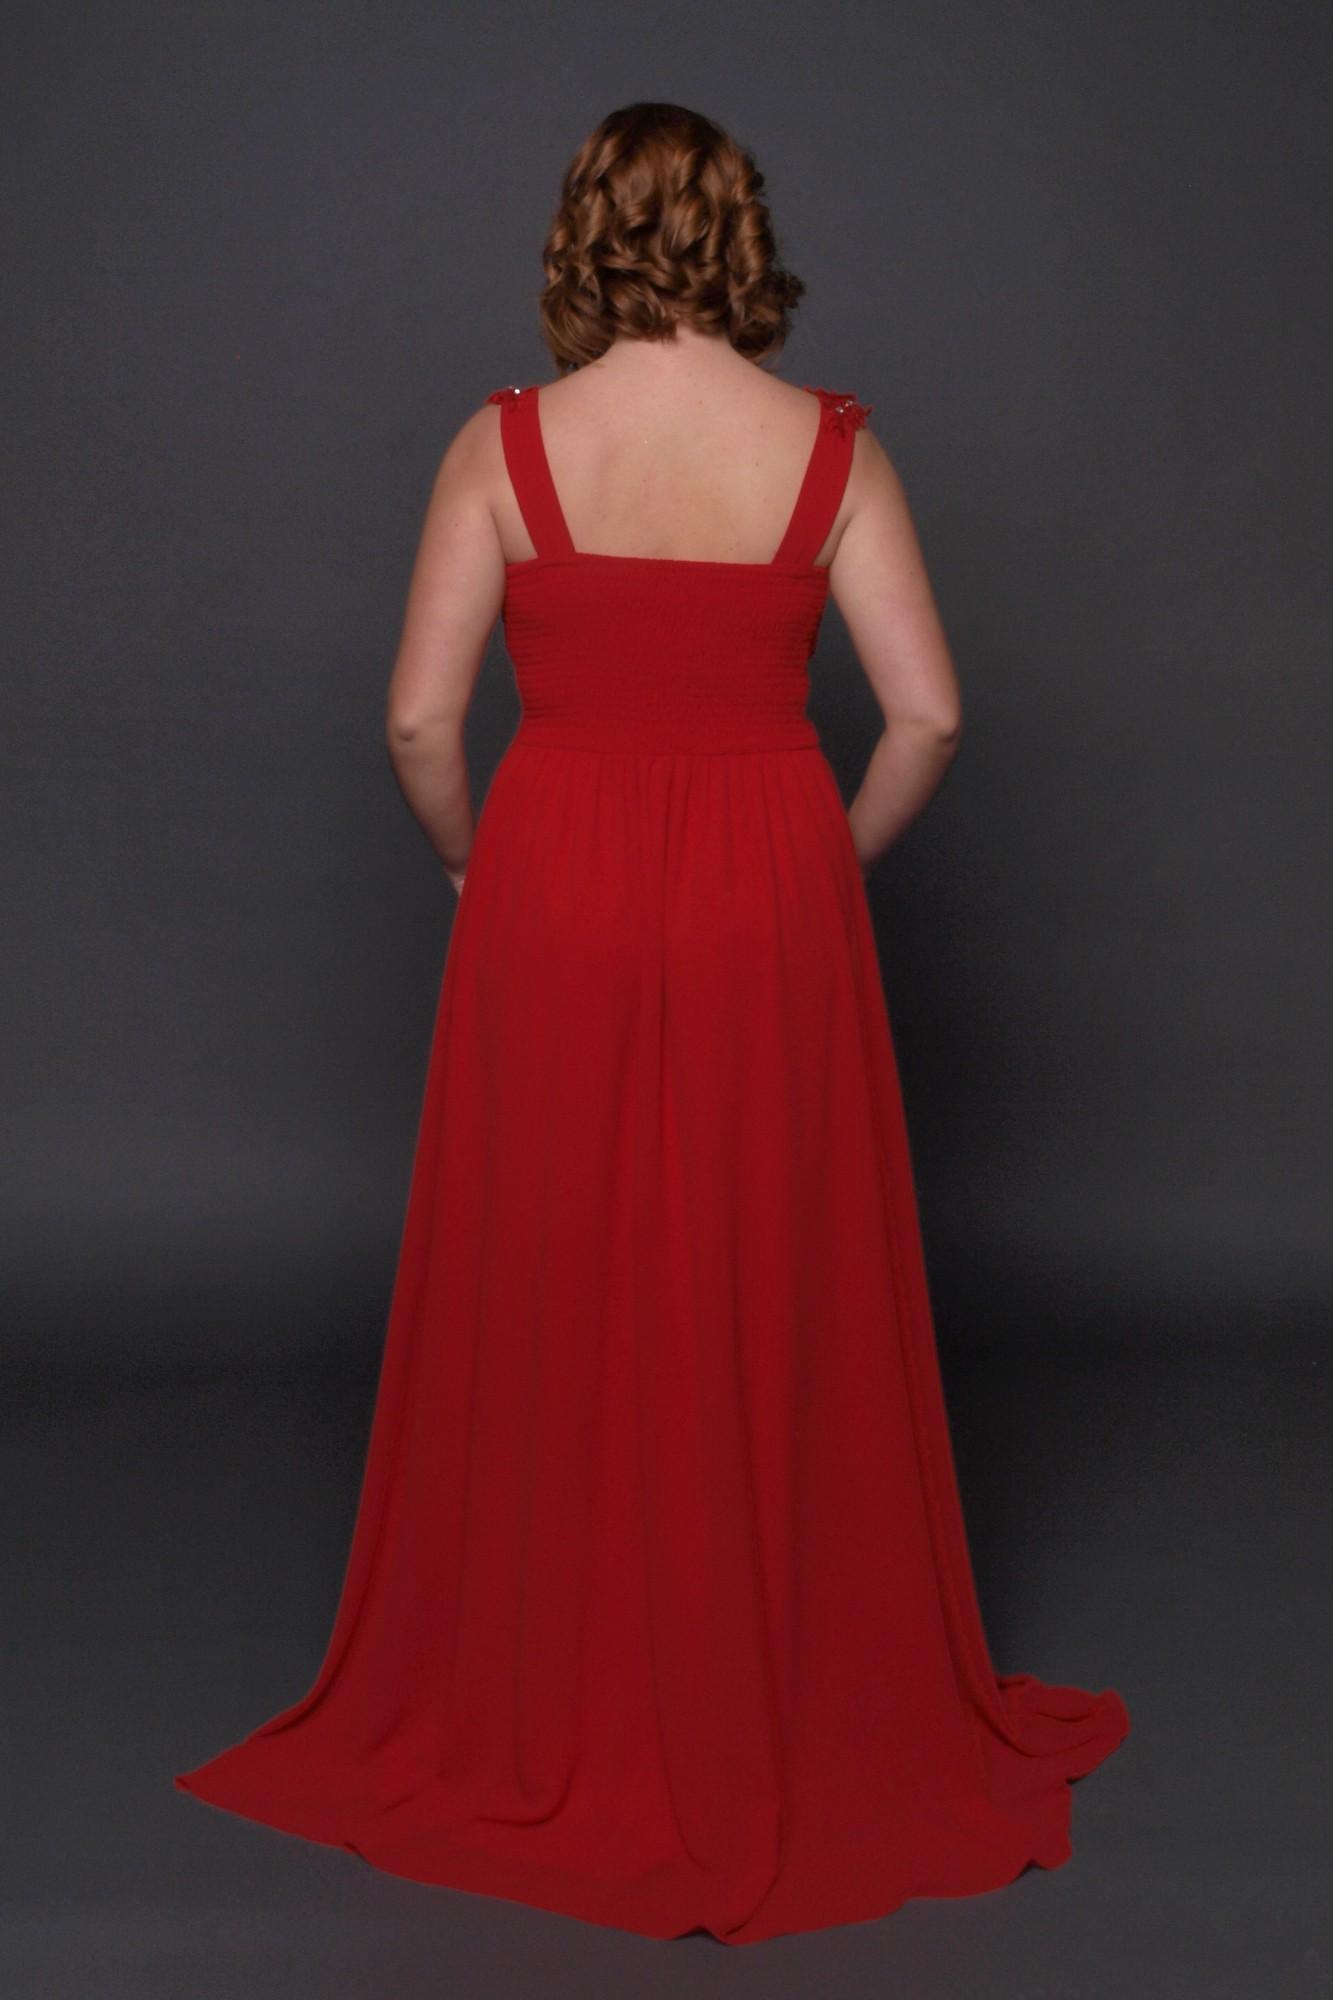 Robe de Coeur - Robe de soirée - robe de cérémonie- robe de demoiselle d'honneur - Albi - Tarn - robe neuve - petit budget - eva et lola